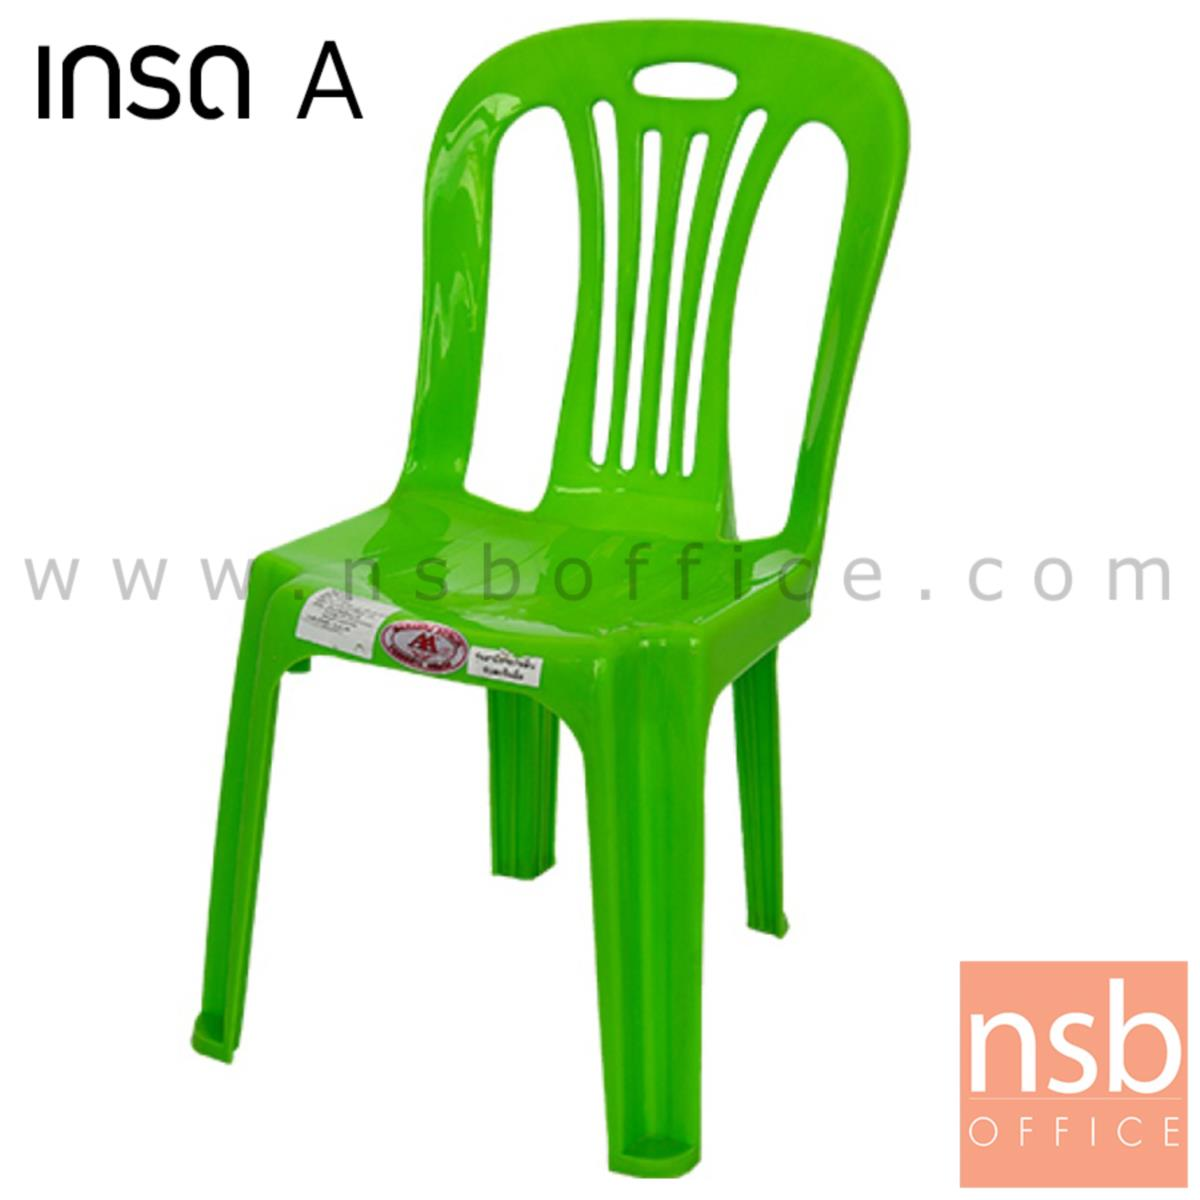 B10A066:เก้าอี้พลาสติกสำหรับเด็ก รุ่น KID_CHAIR ซ้อนเก็บได้ (พลาสติกเกรด A)